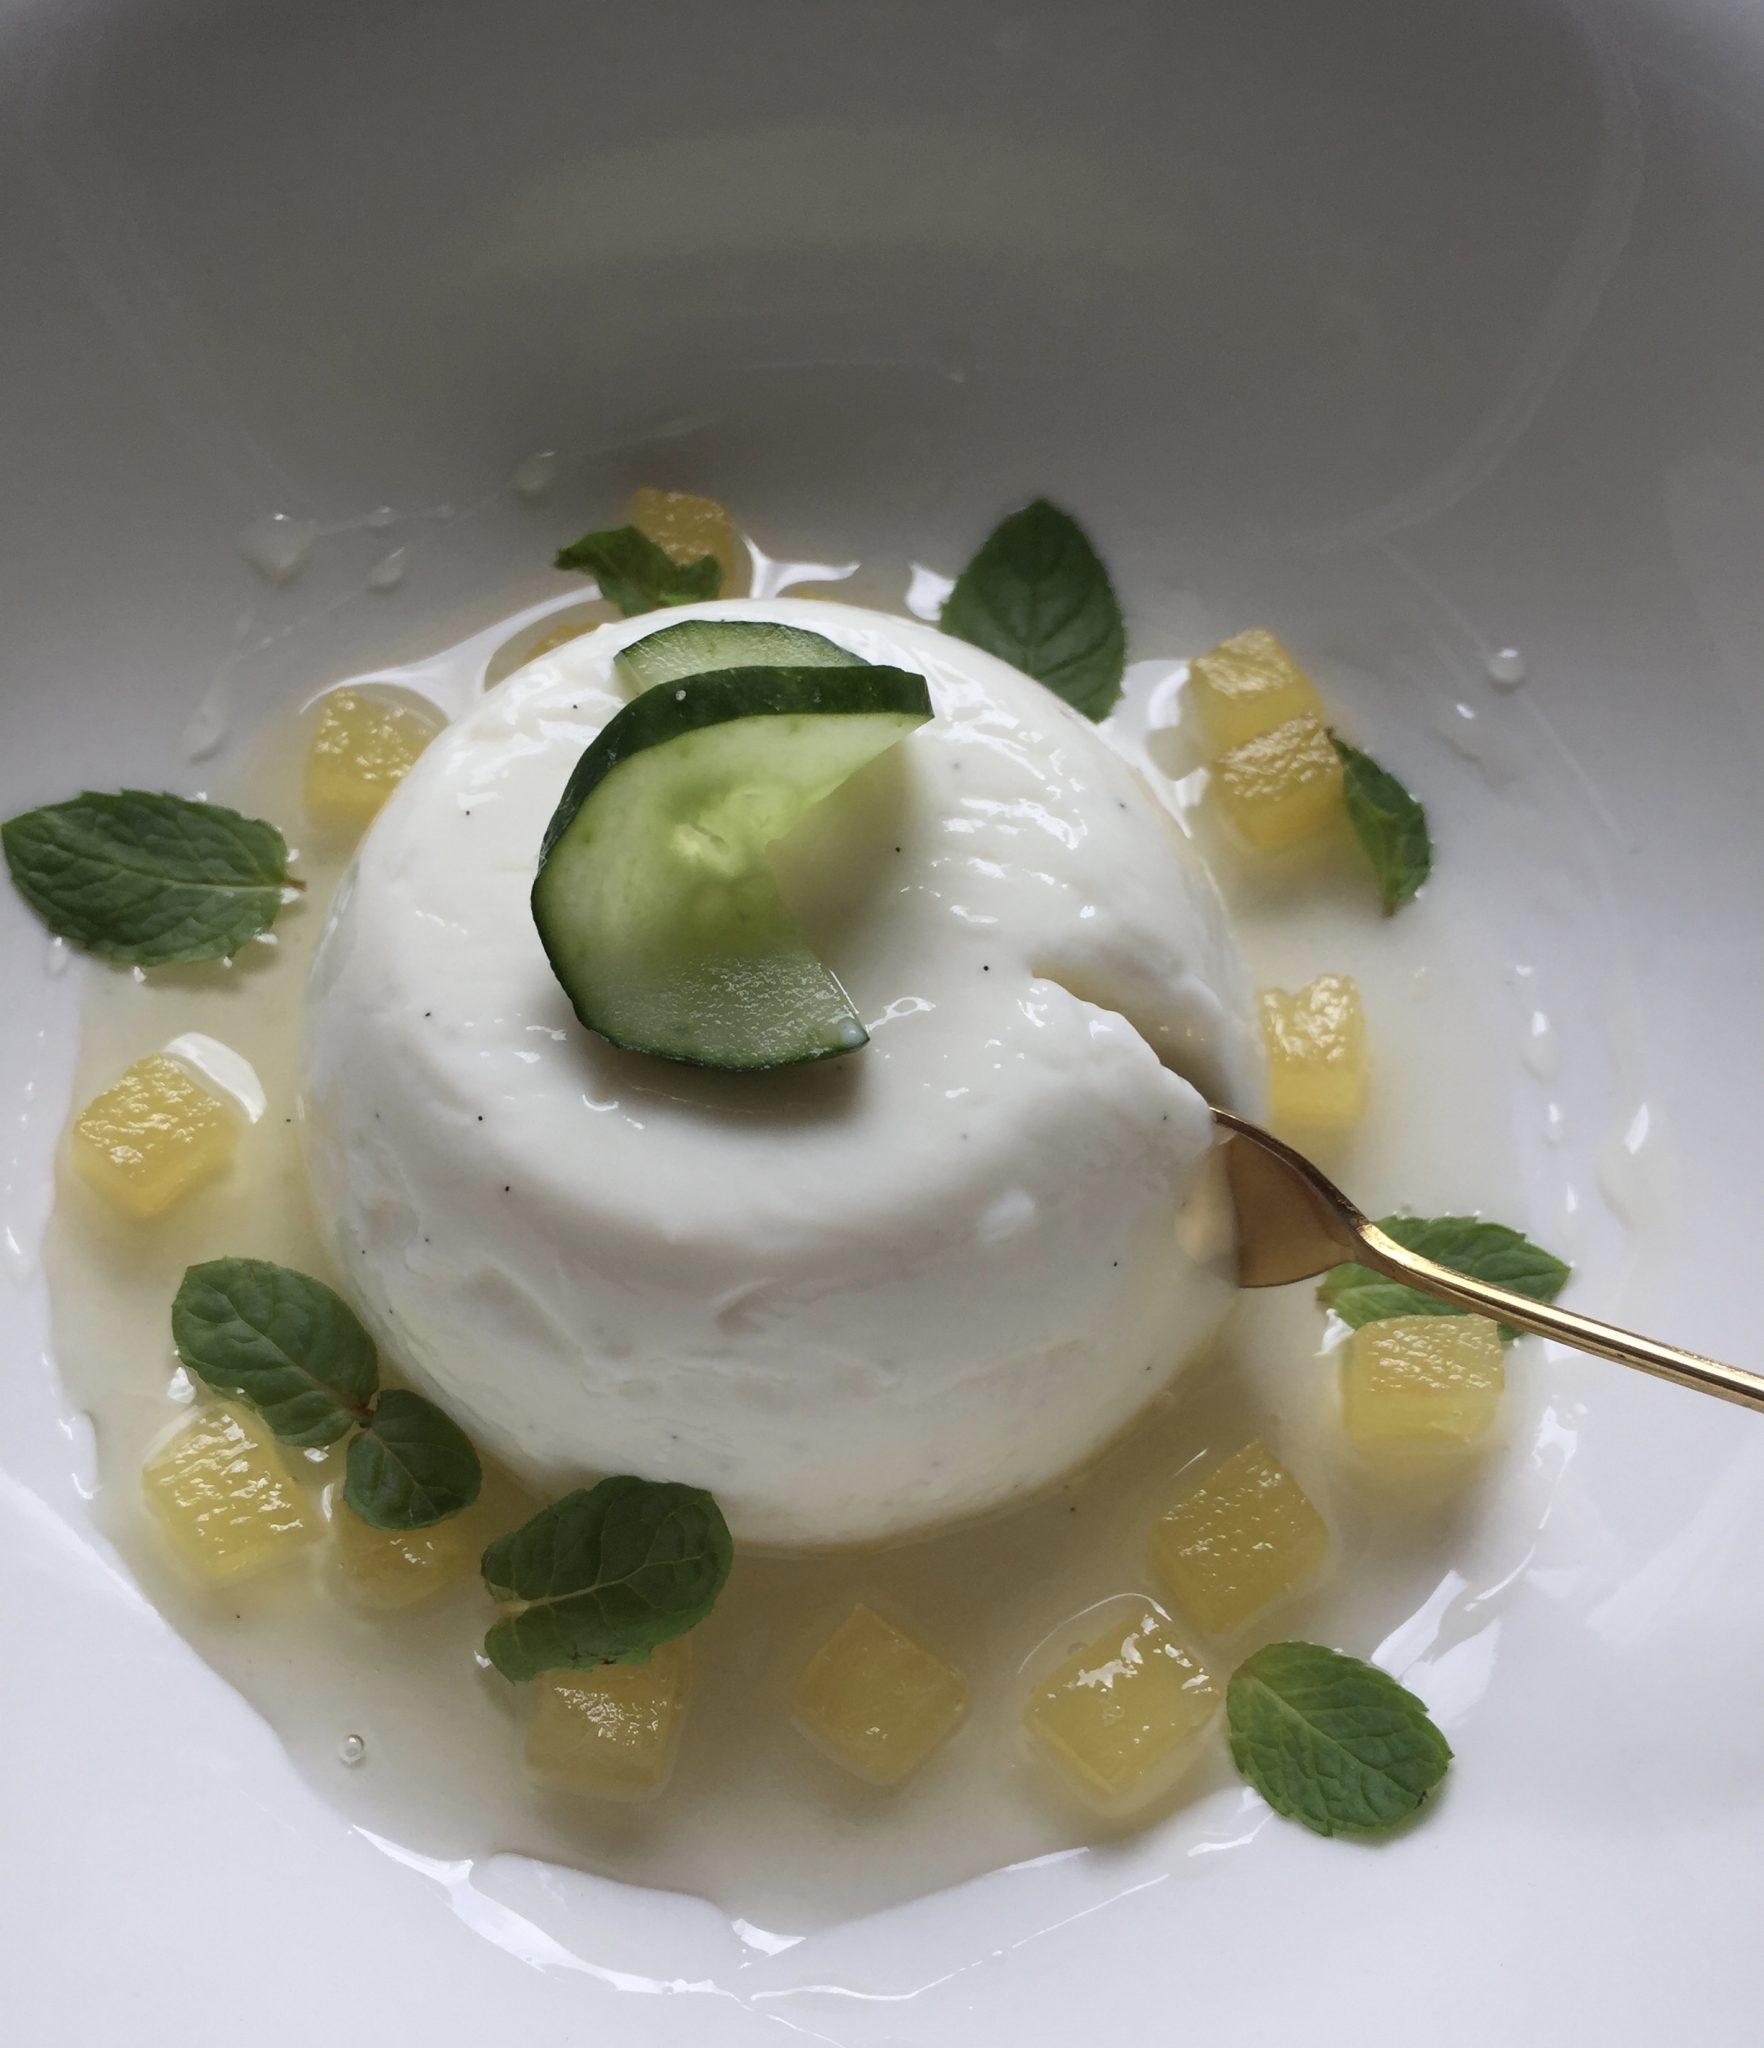 Greek Yogurt Panna Cotta with Gin & Tonic Syrup